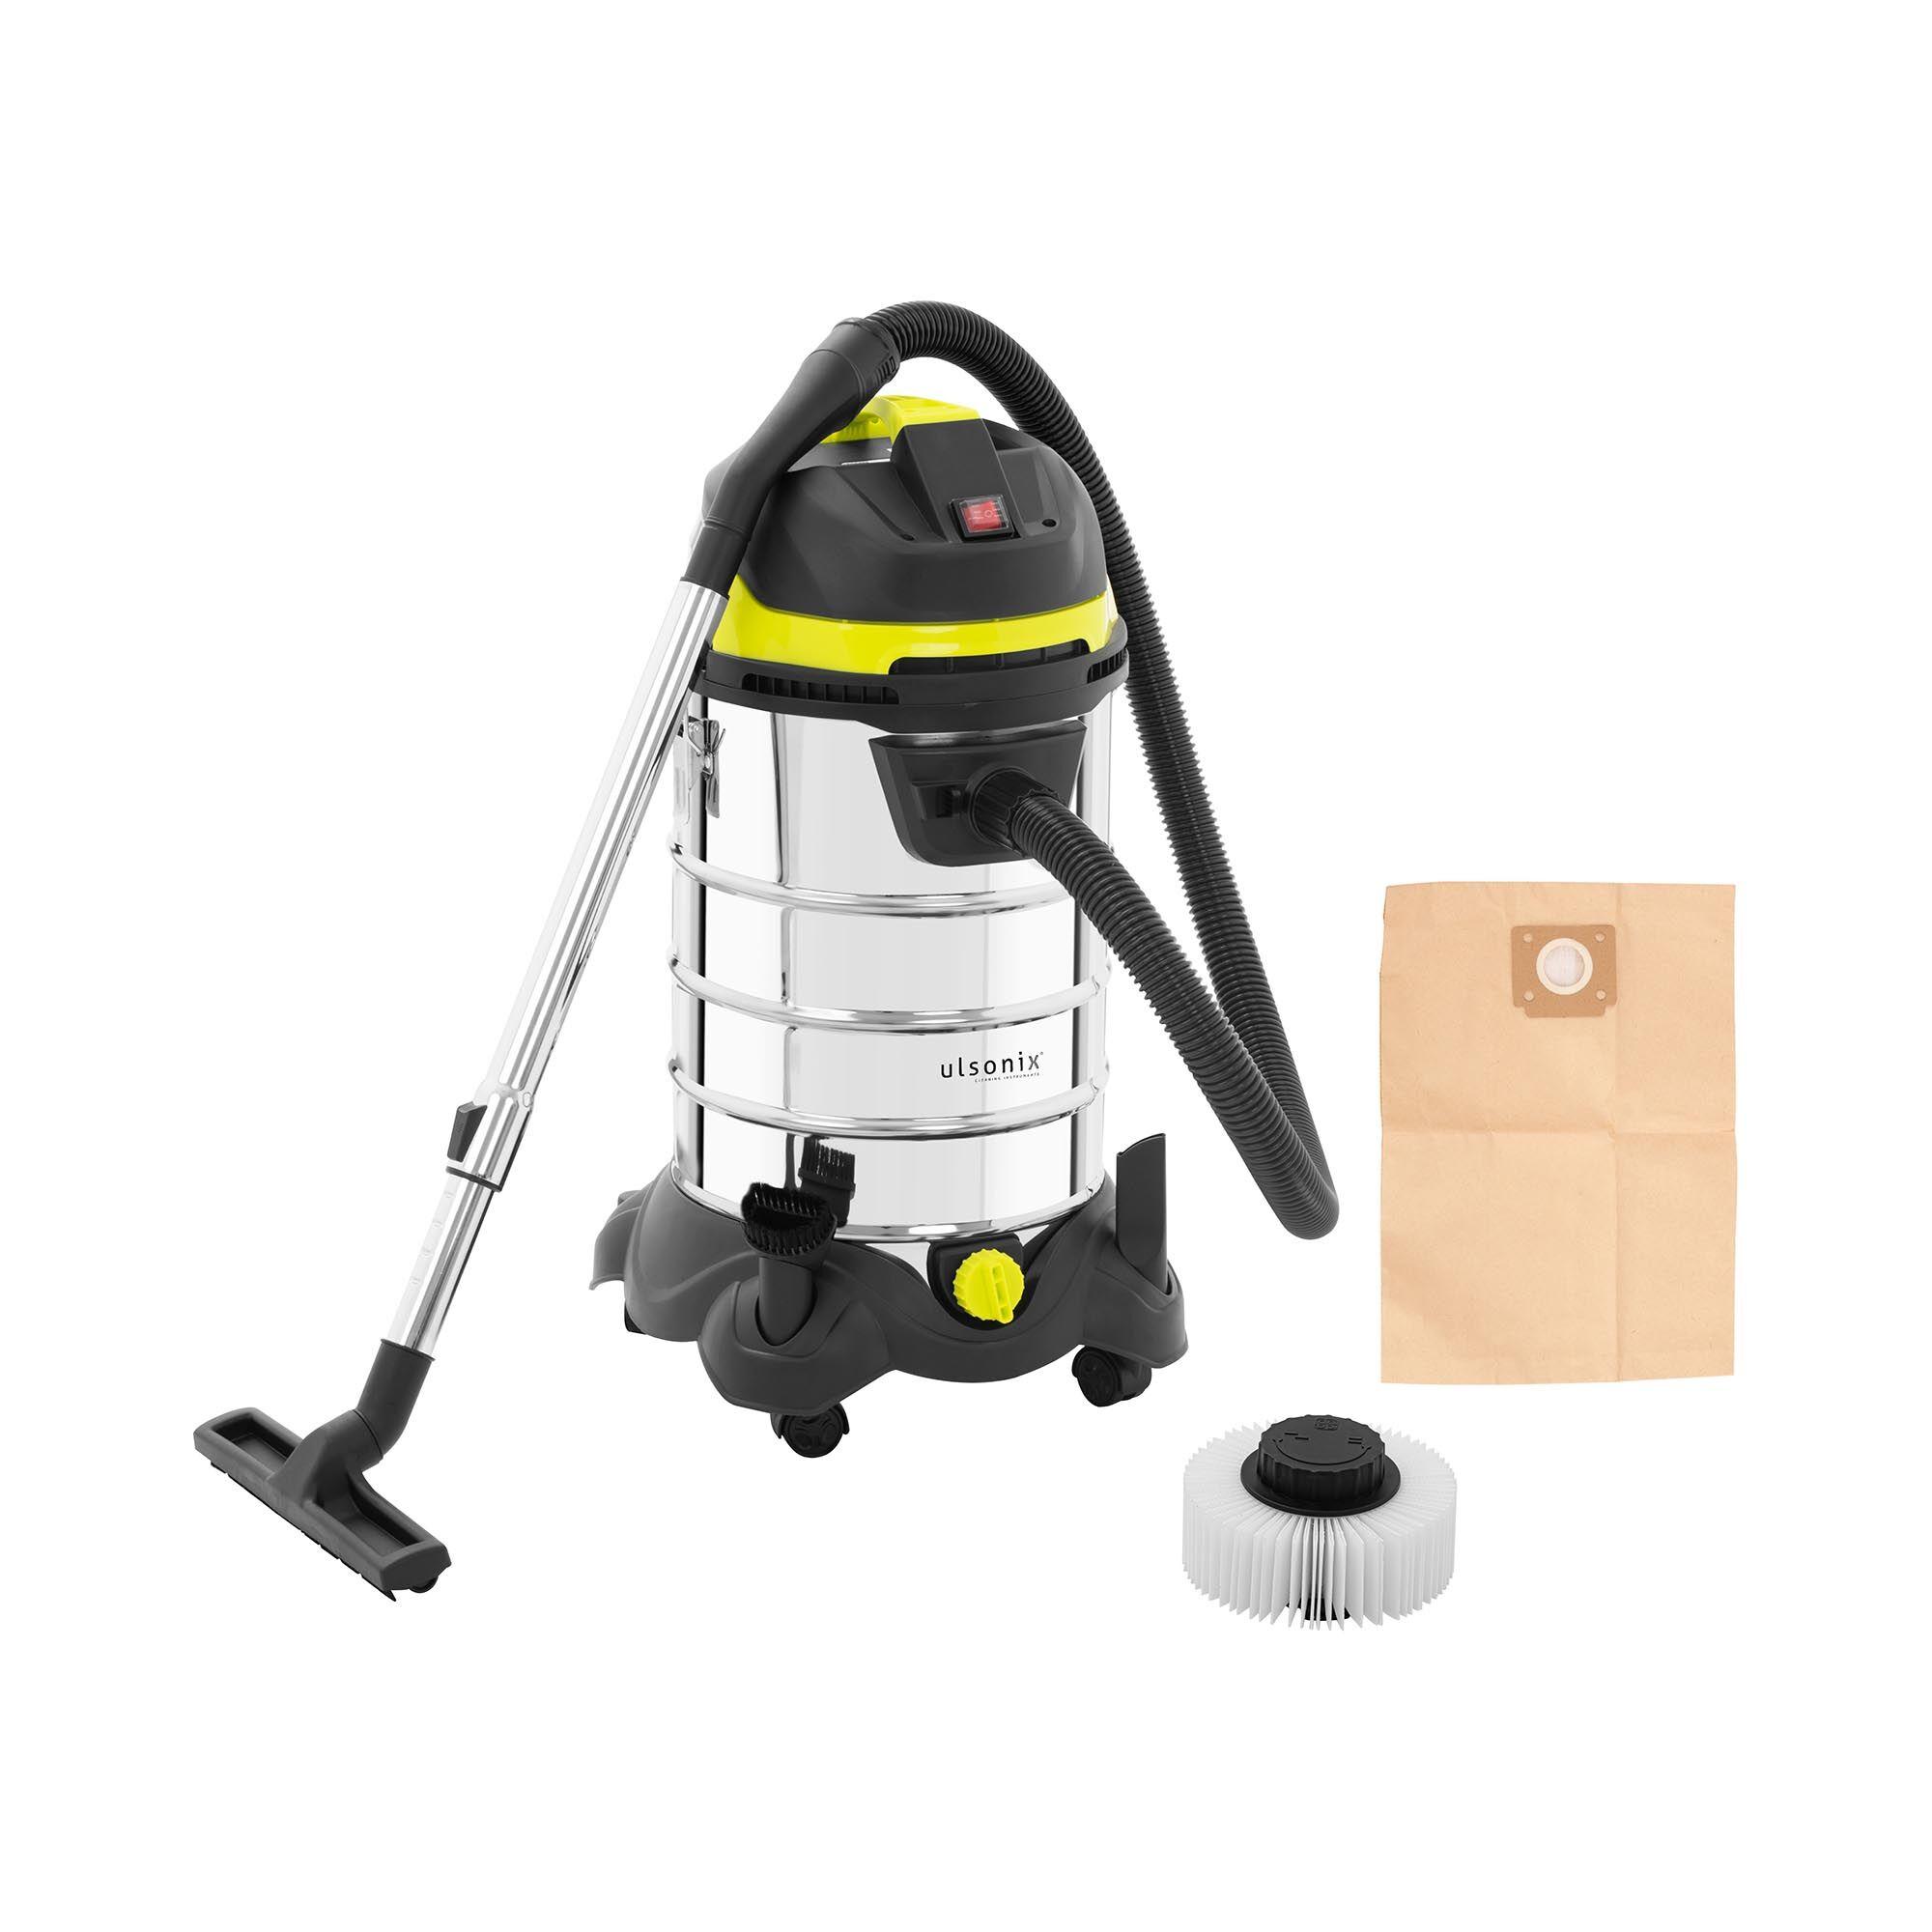 ulsonix Wet/Dry Vacuum Cleaner - 1,400 W - 30 L FLOORCLEAN 30D